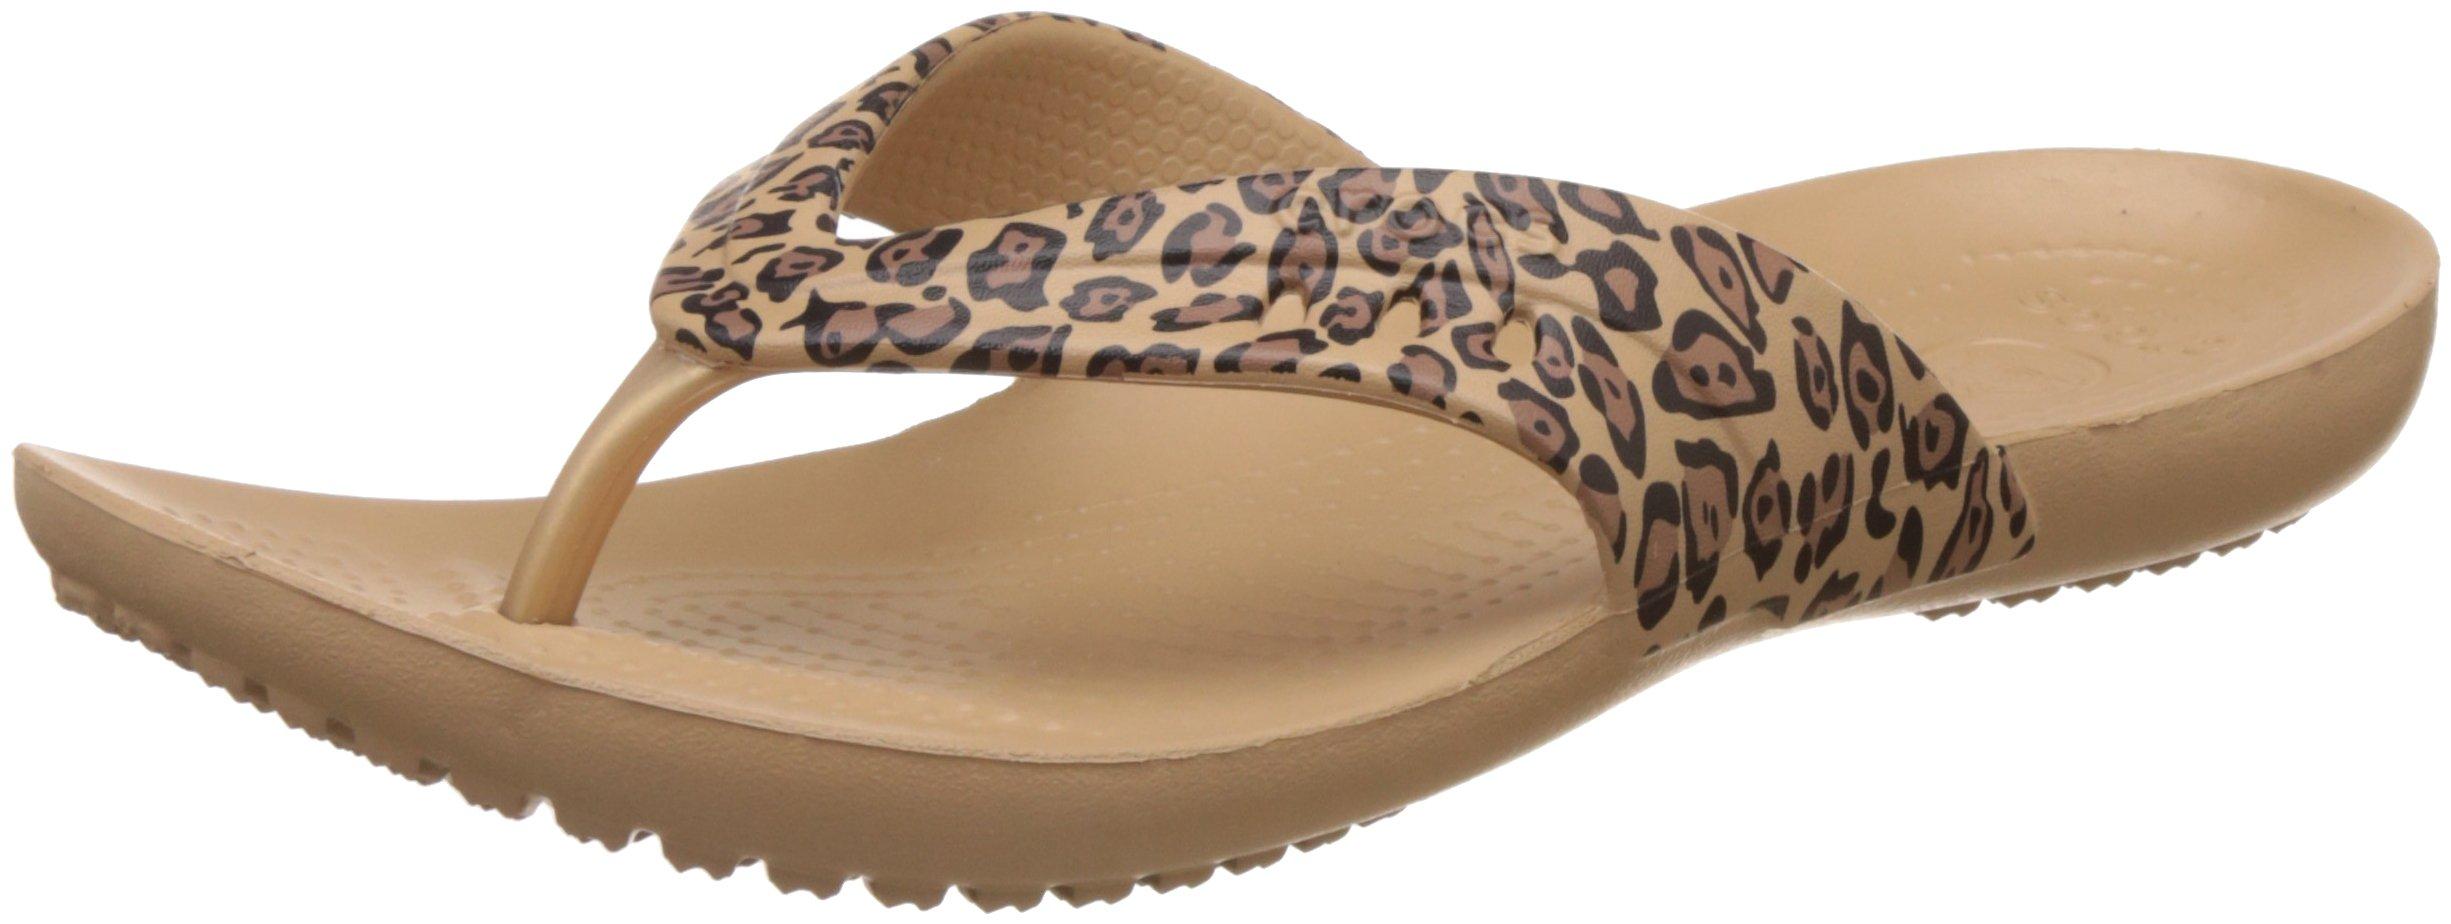 Crocs Women's Kadee Print Flip-Flop, Leopard, 8 M US